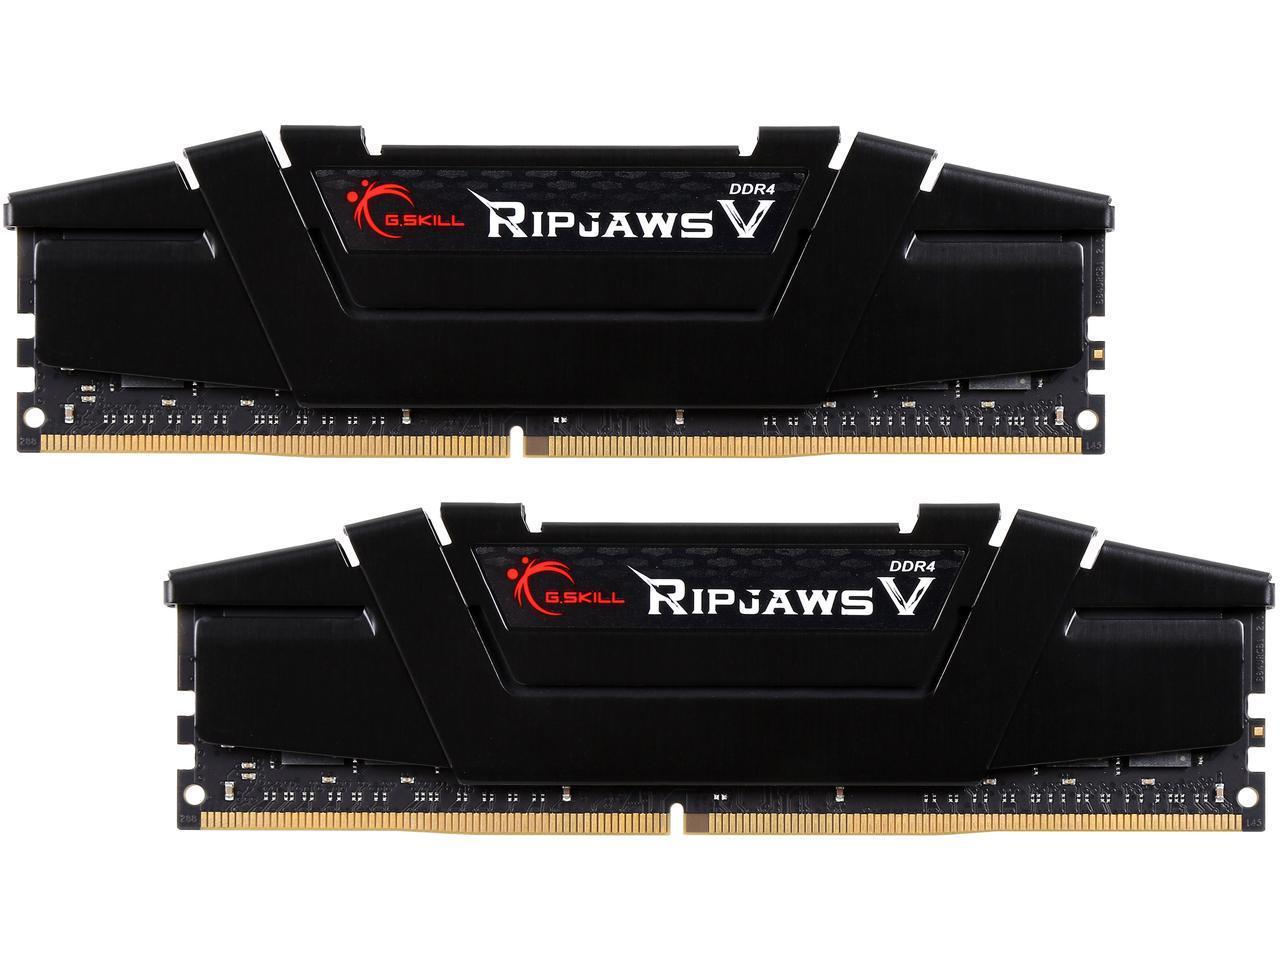 G.SKILL Ripjaws V Series 32GB (2 x 16GB) 288-Pin DDR4 SDRAM DDR4 3200 (PC4 25600) Desktop Memory Model F4-3200C16D-32GVK $135 $134.99